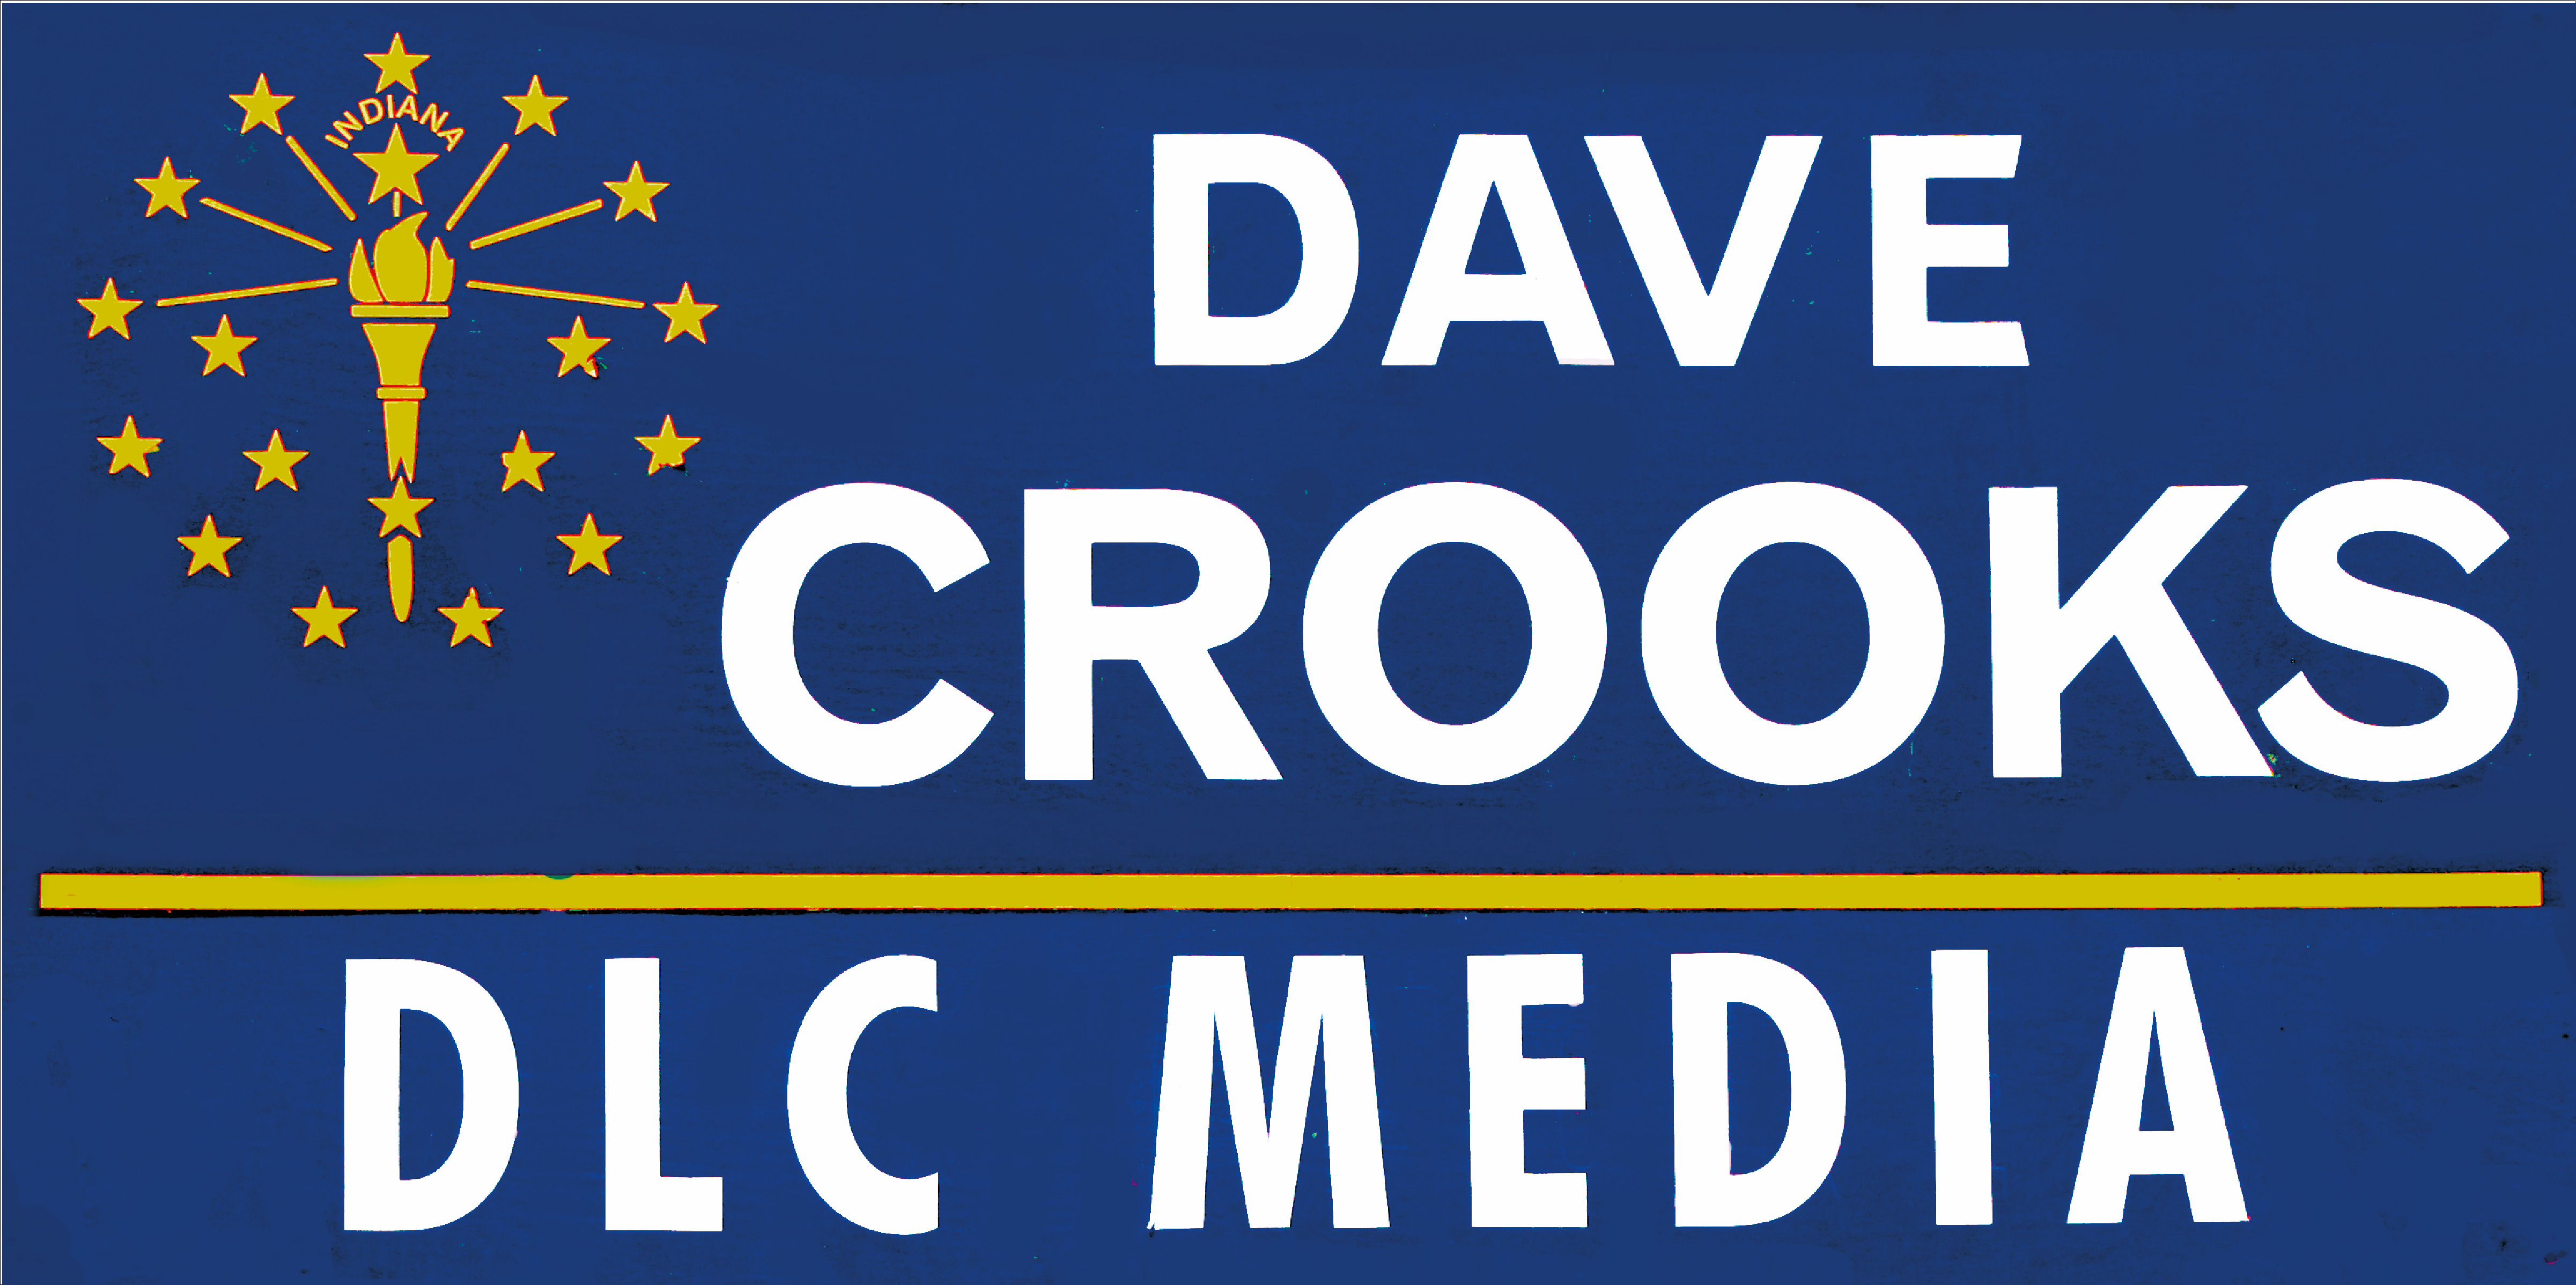 Dave-Crooks